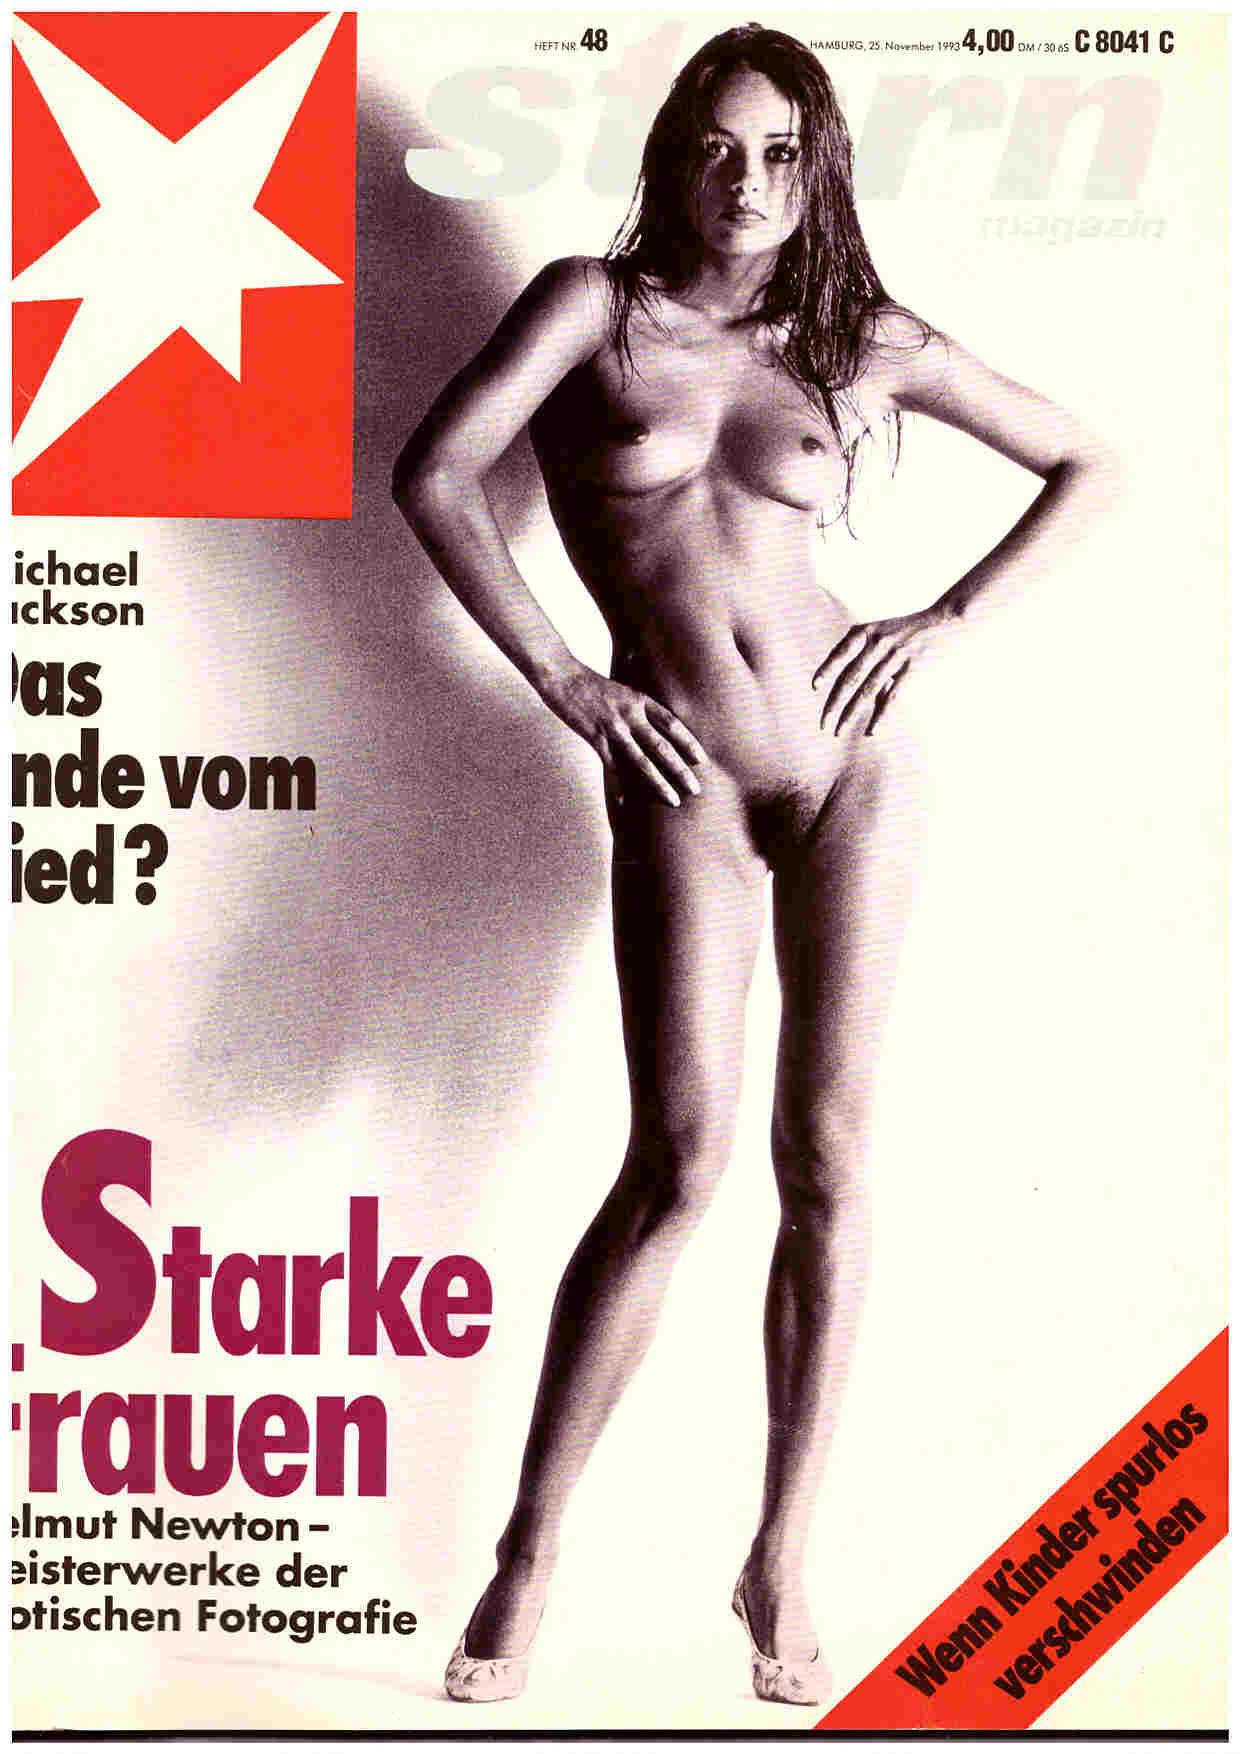 Titelbild Stern November 1993